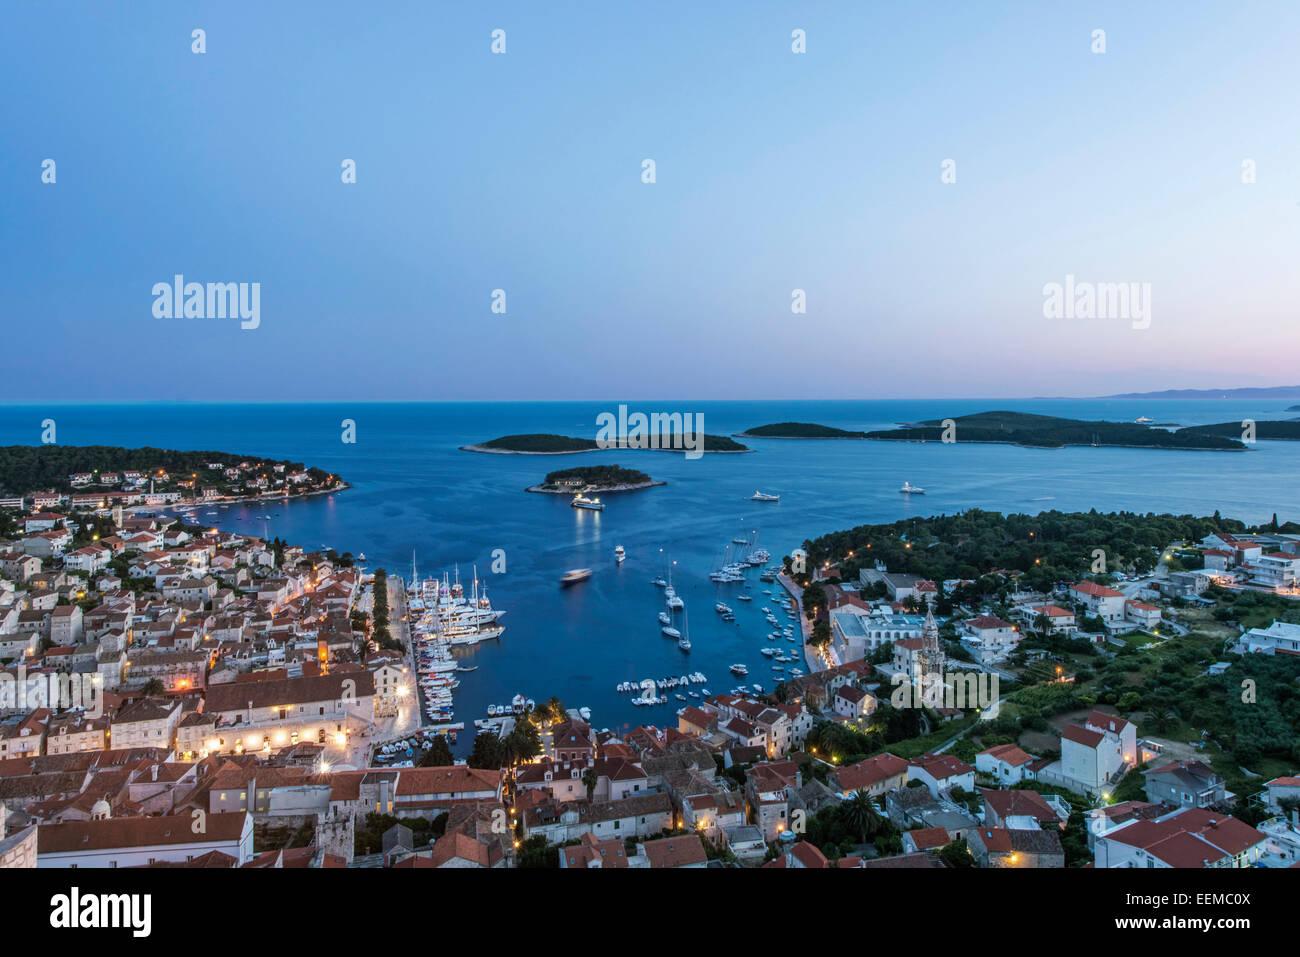 Vista aérea de la ciudad costera de ladera, Hvar, Split, Croacia Foto de stock